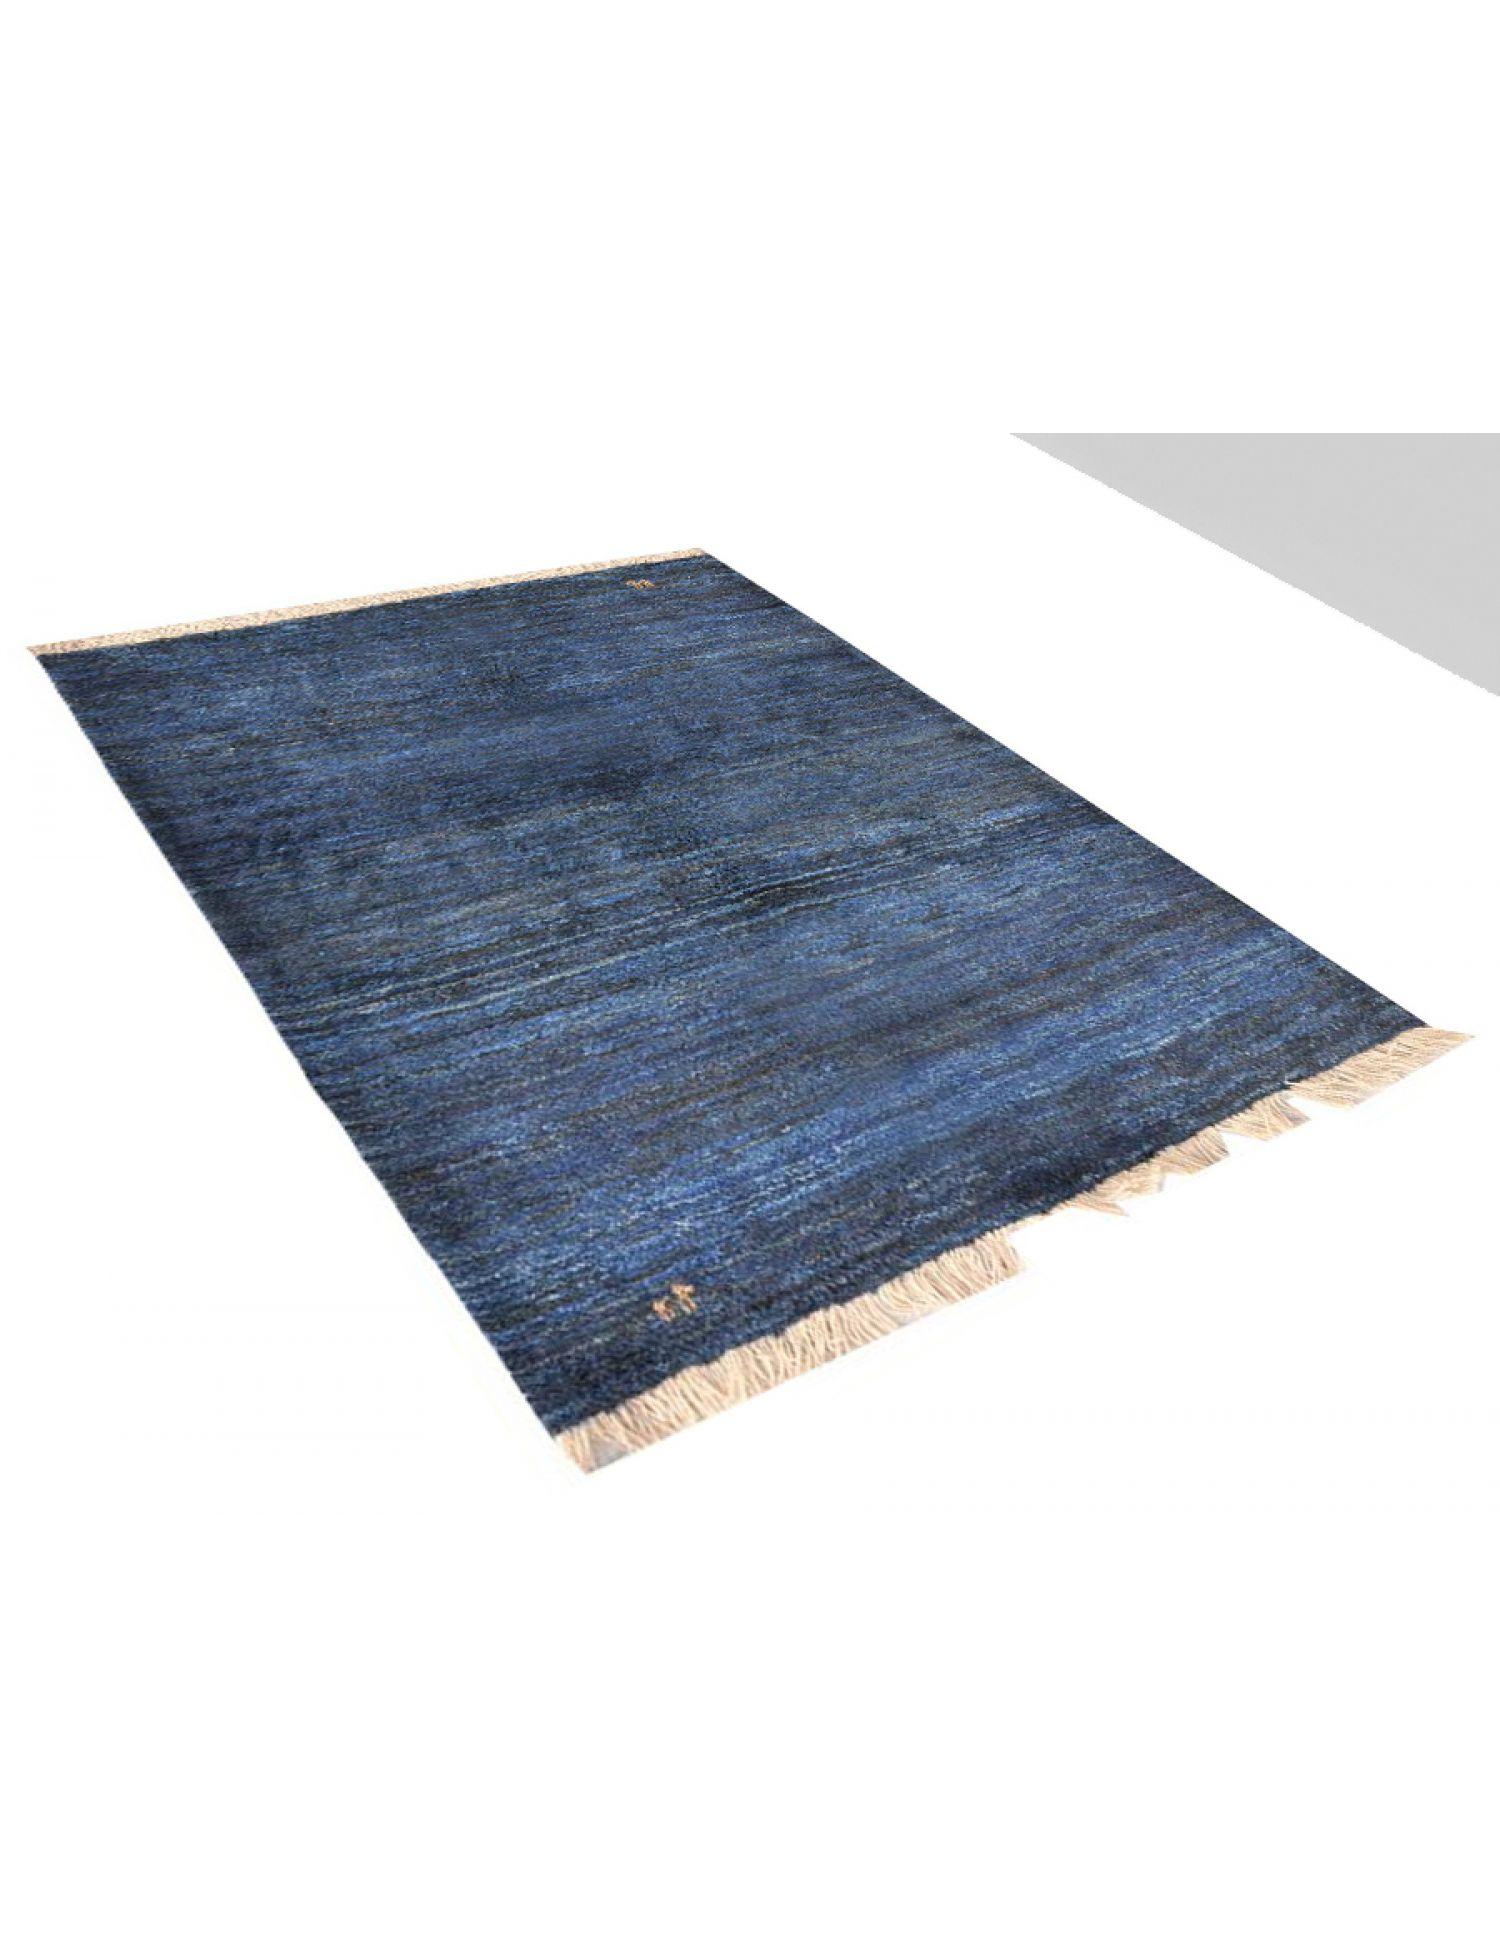 Moderne Teppiche  blau <br/>180 x 124 cm